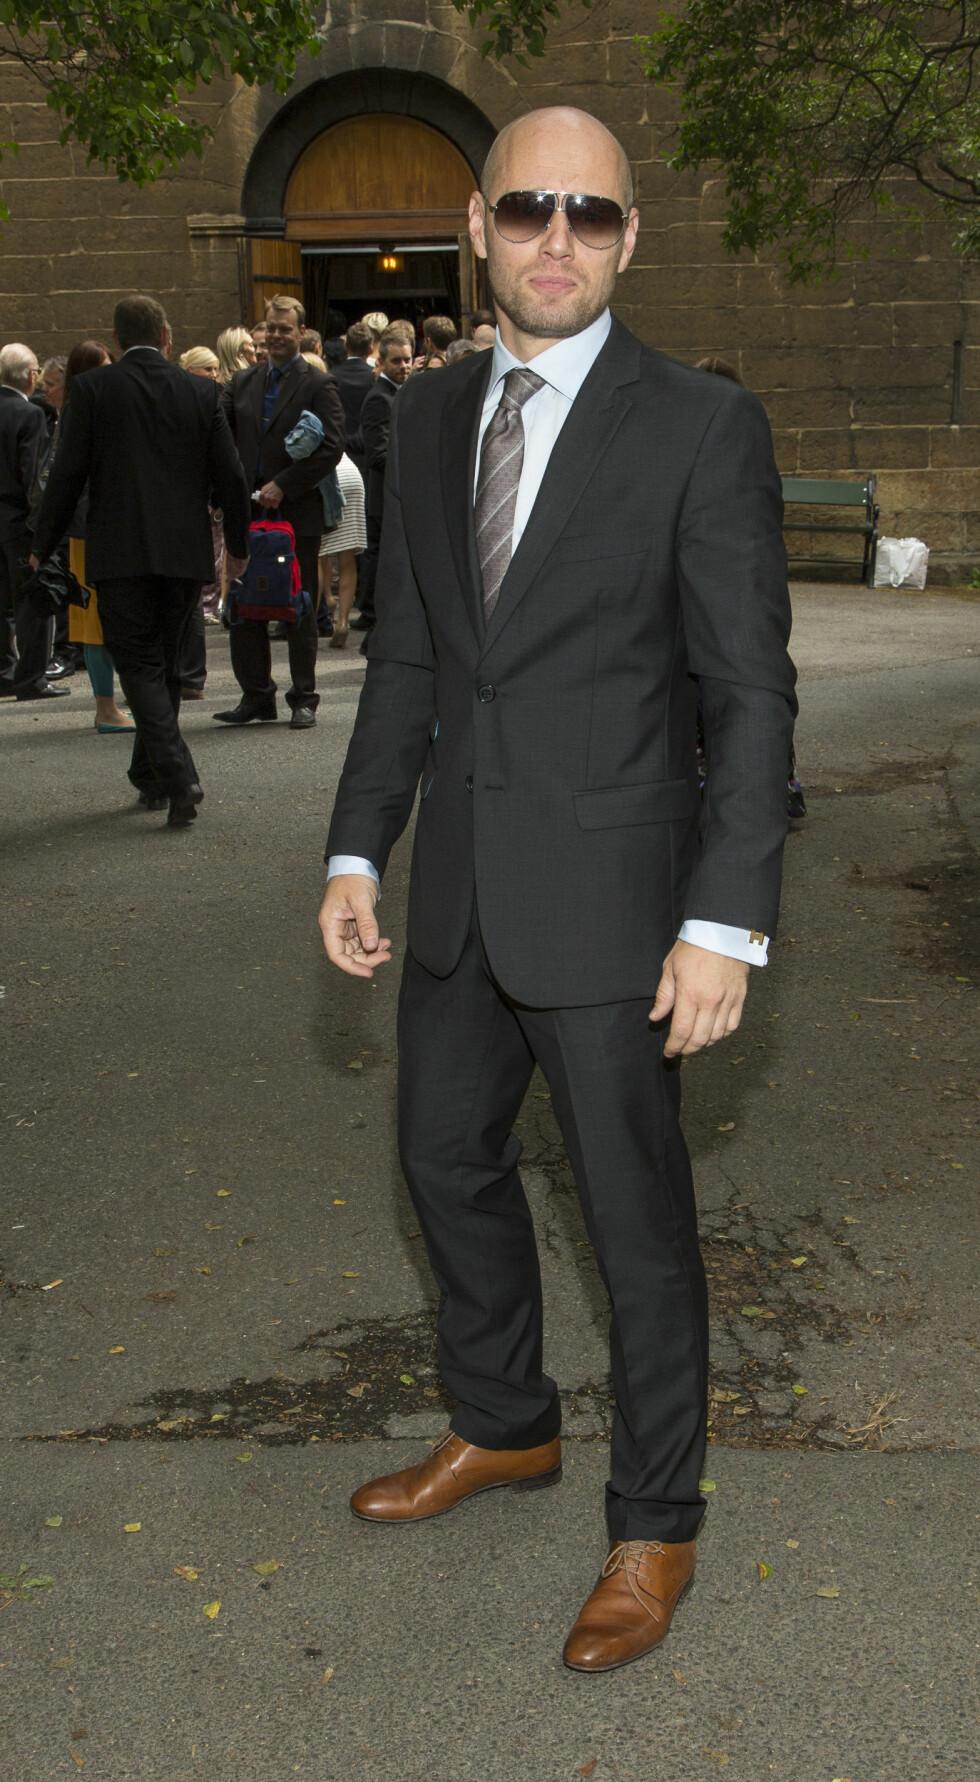 ANONYM: Skuespiller Aksel Hennie var iført mørke solbriller for anledningen. Foto: Tor Lindseth